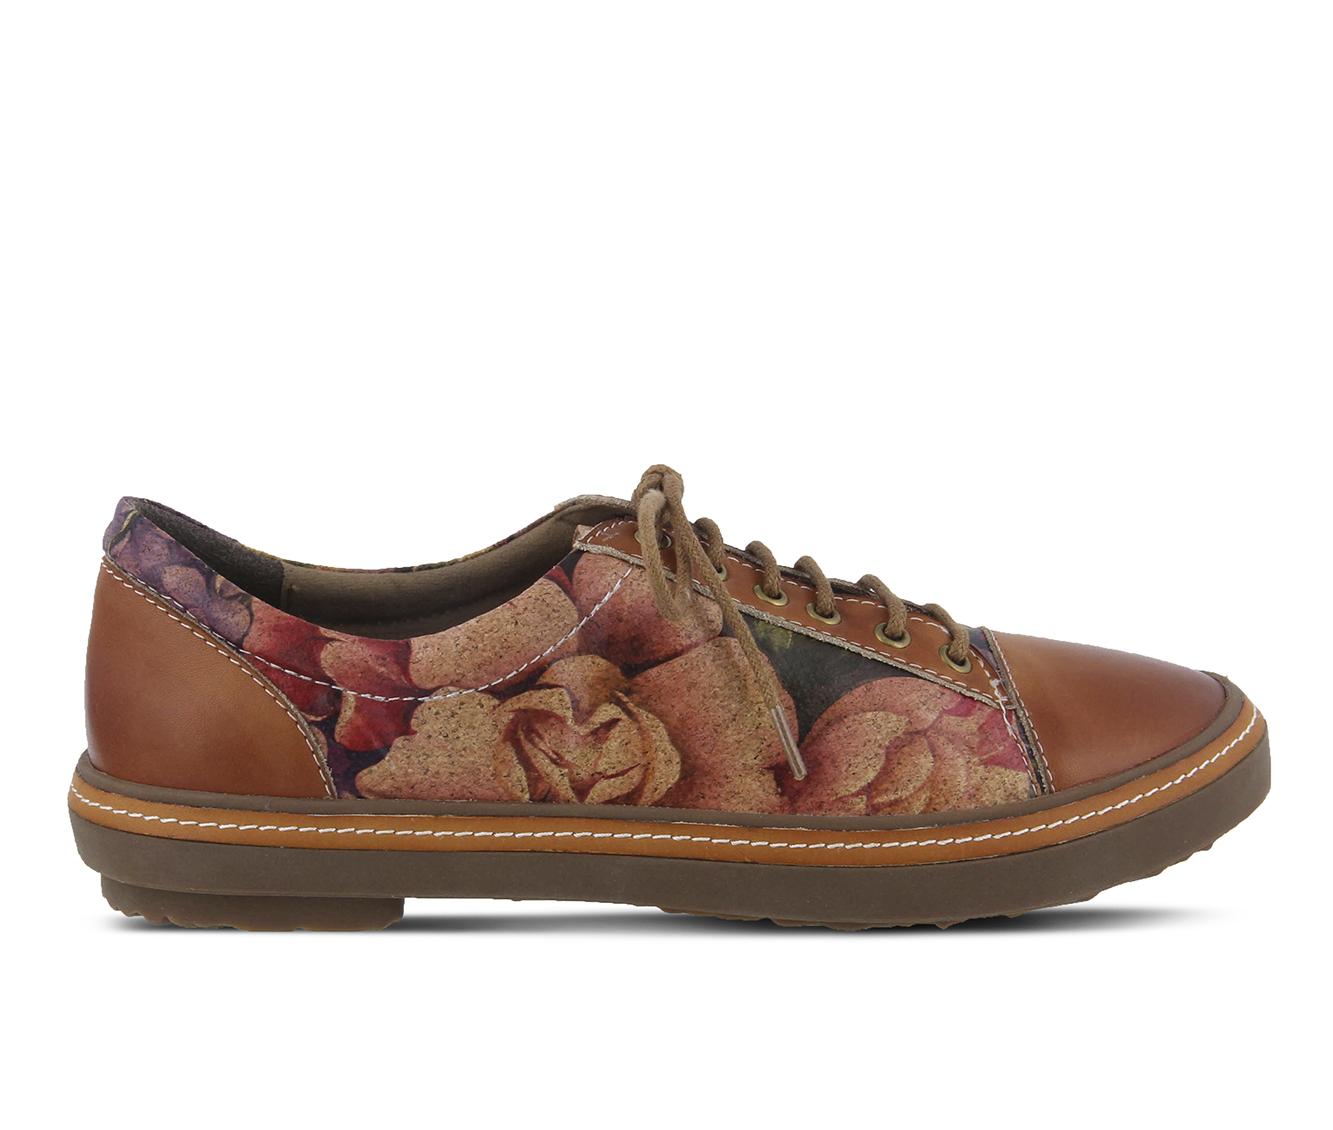 L'Artiste Libbi-Rose Women's Shoe (Brown Leather)